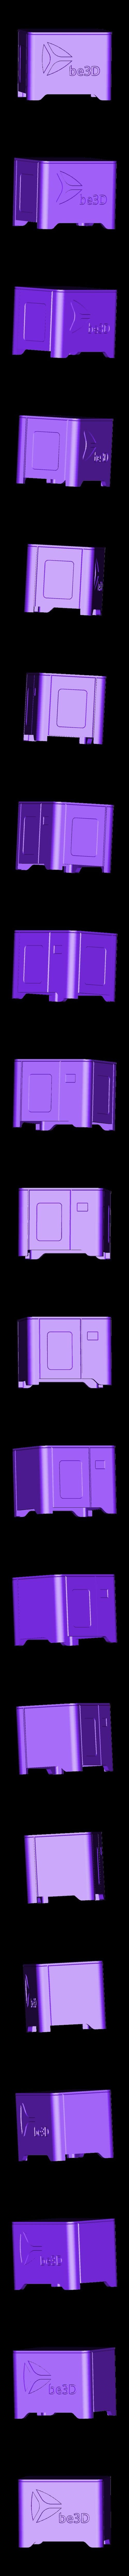 DeeGreen.stl Descargar archivo STL gratis DeeGreen • Objeto para imprimir en 3D, Ysoft_be3D